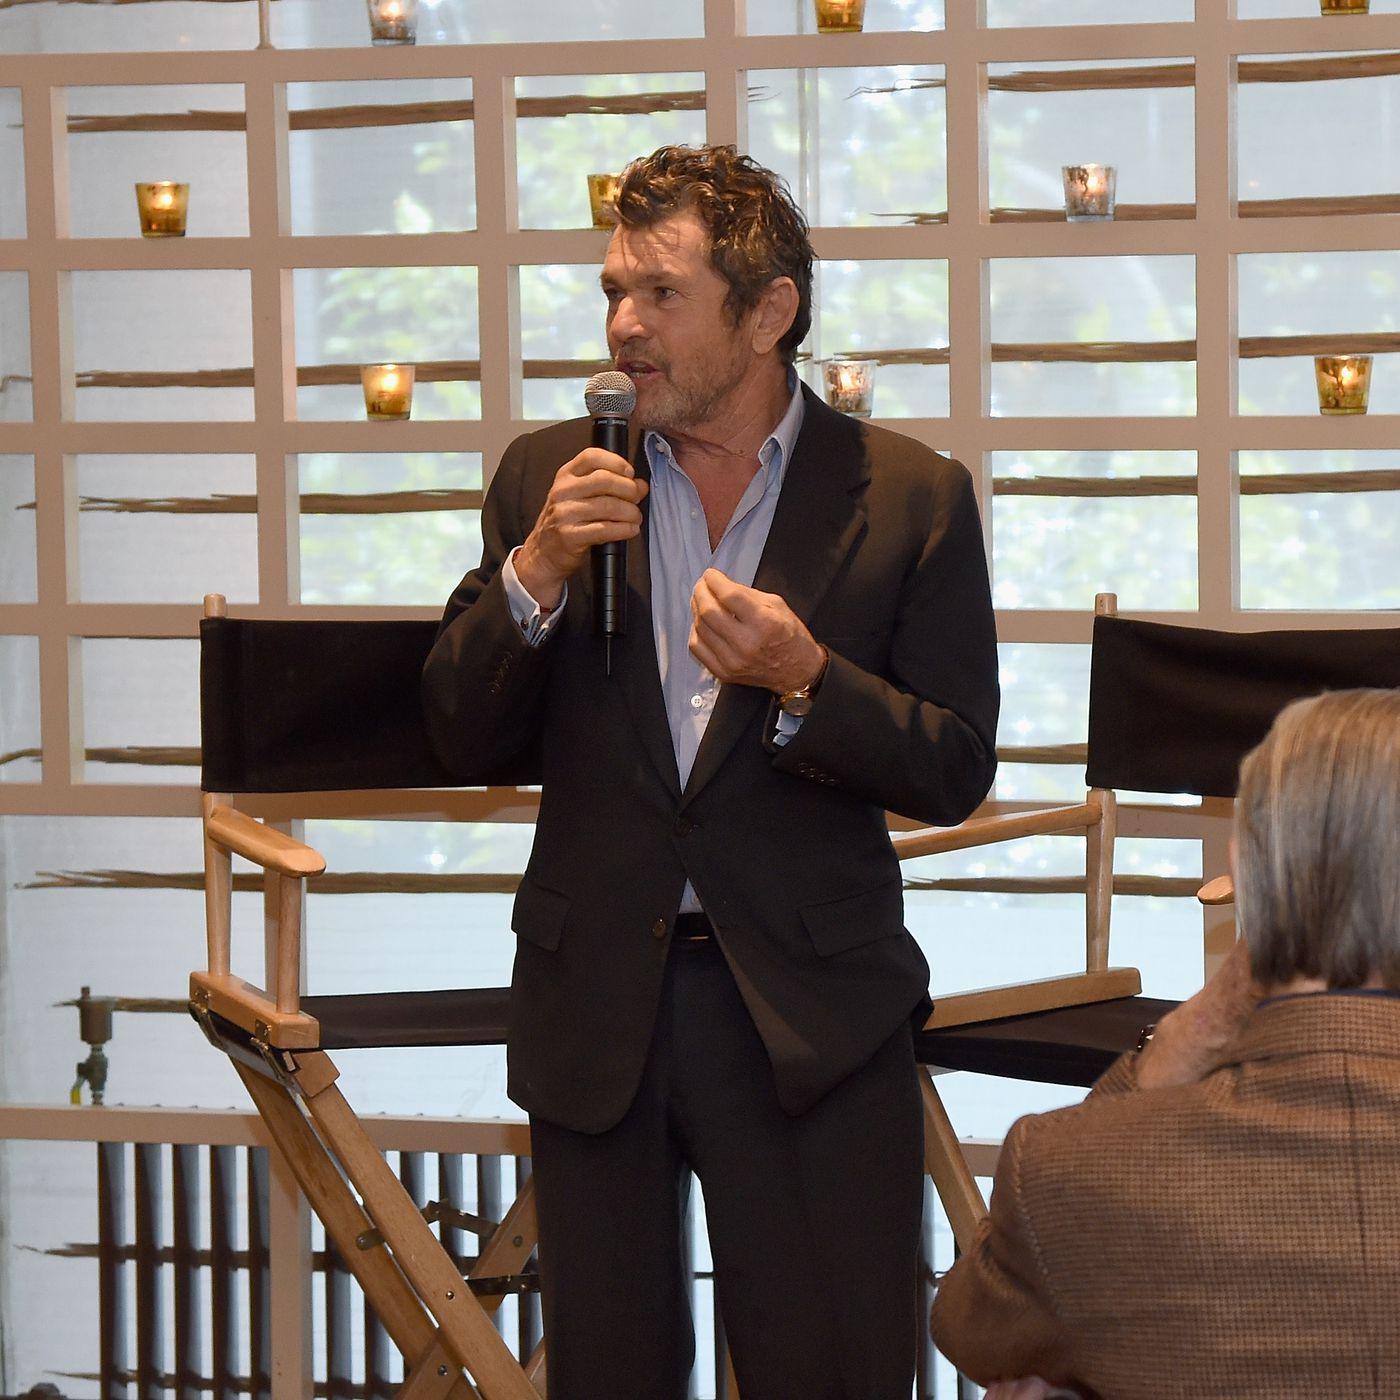 Full transcript: Jann Wenner biographer Joe Hagan on Recode